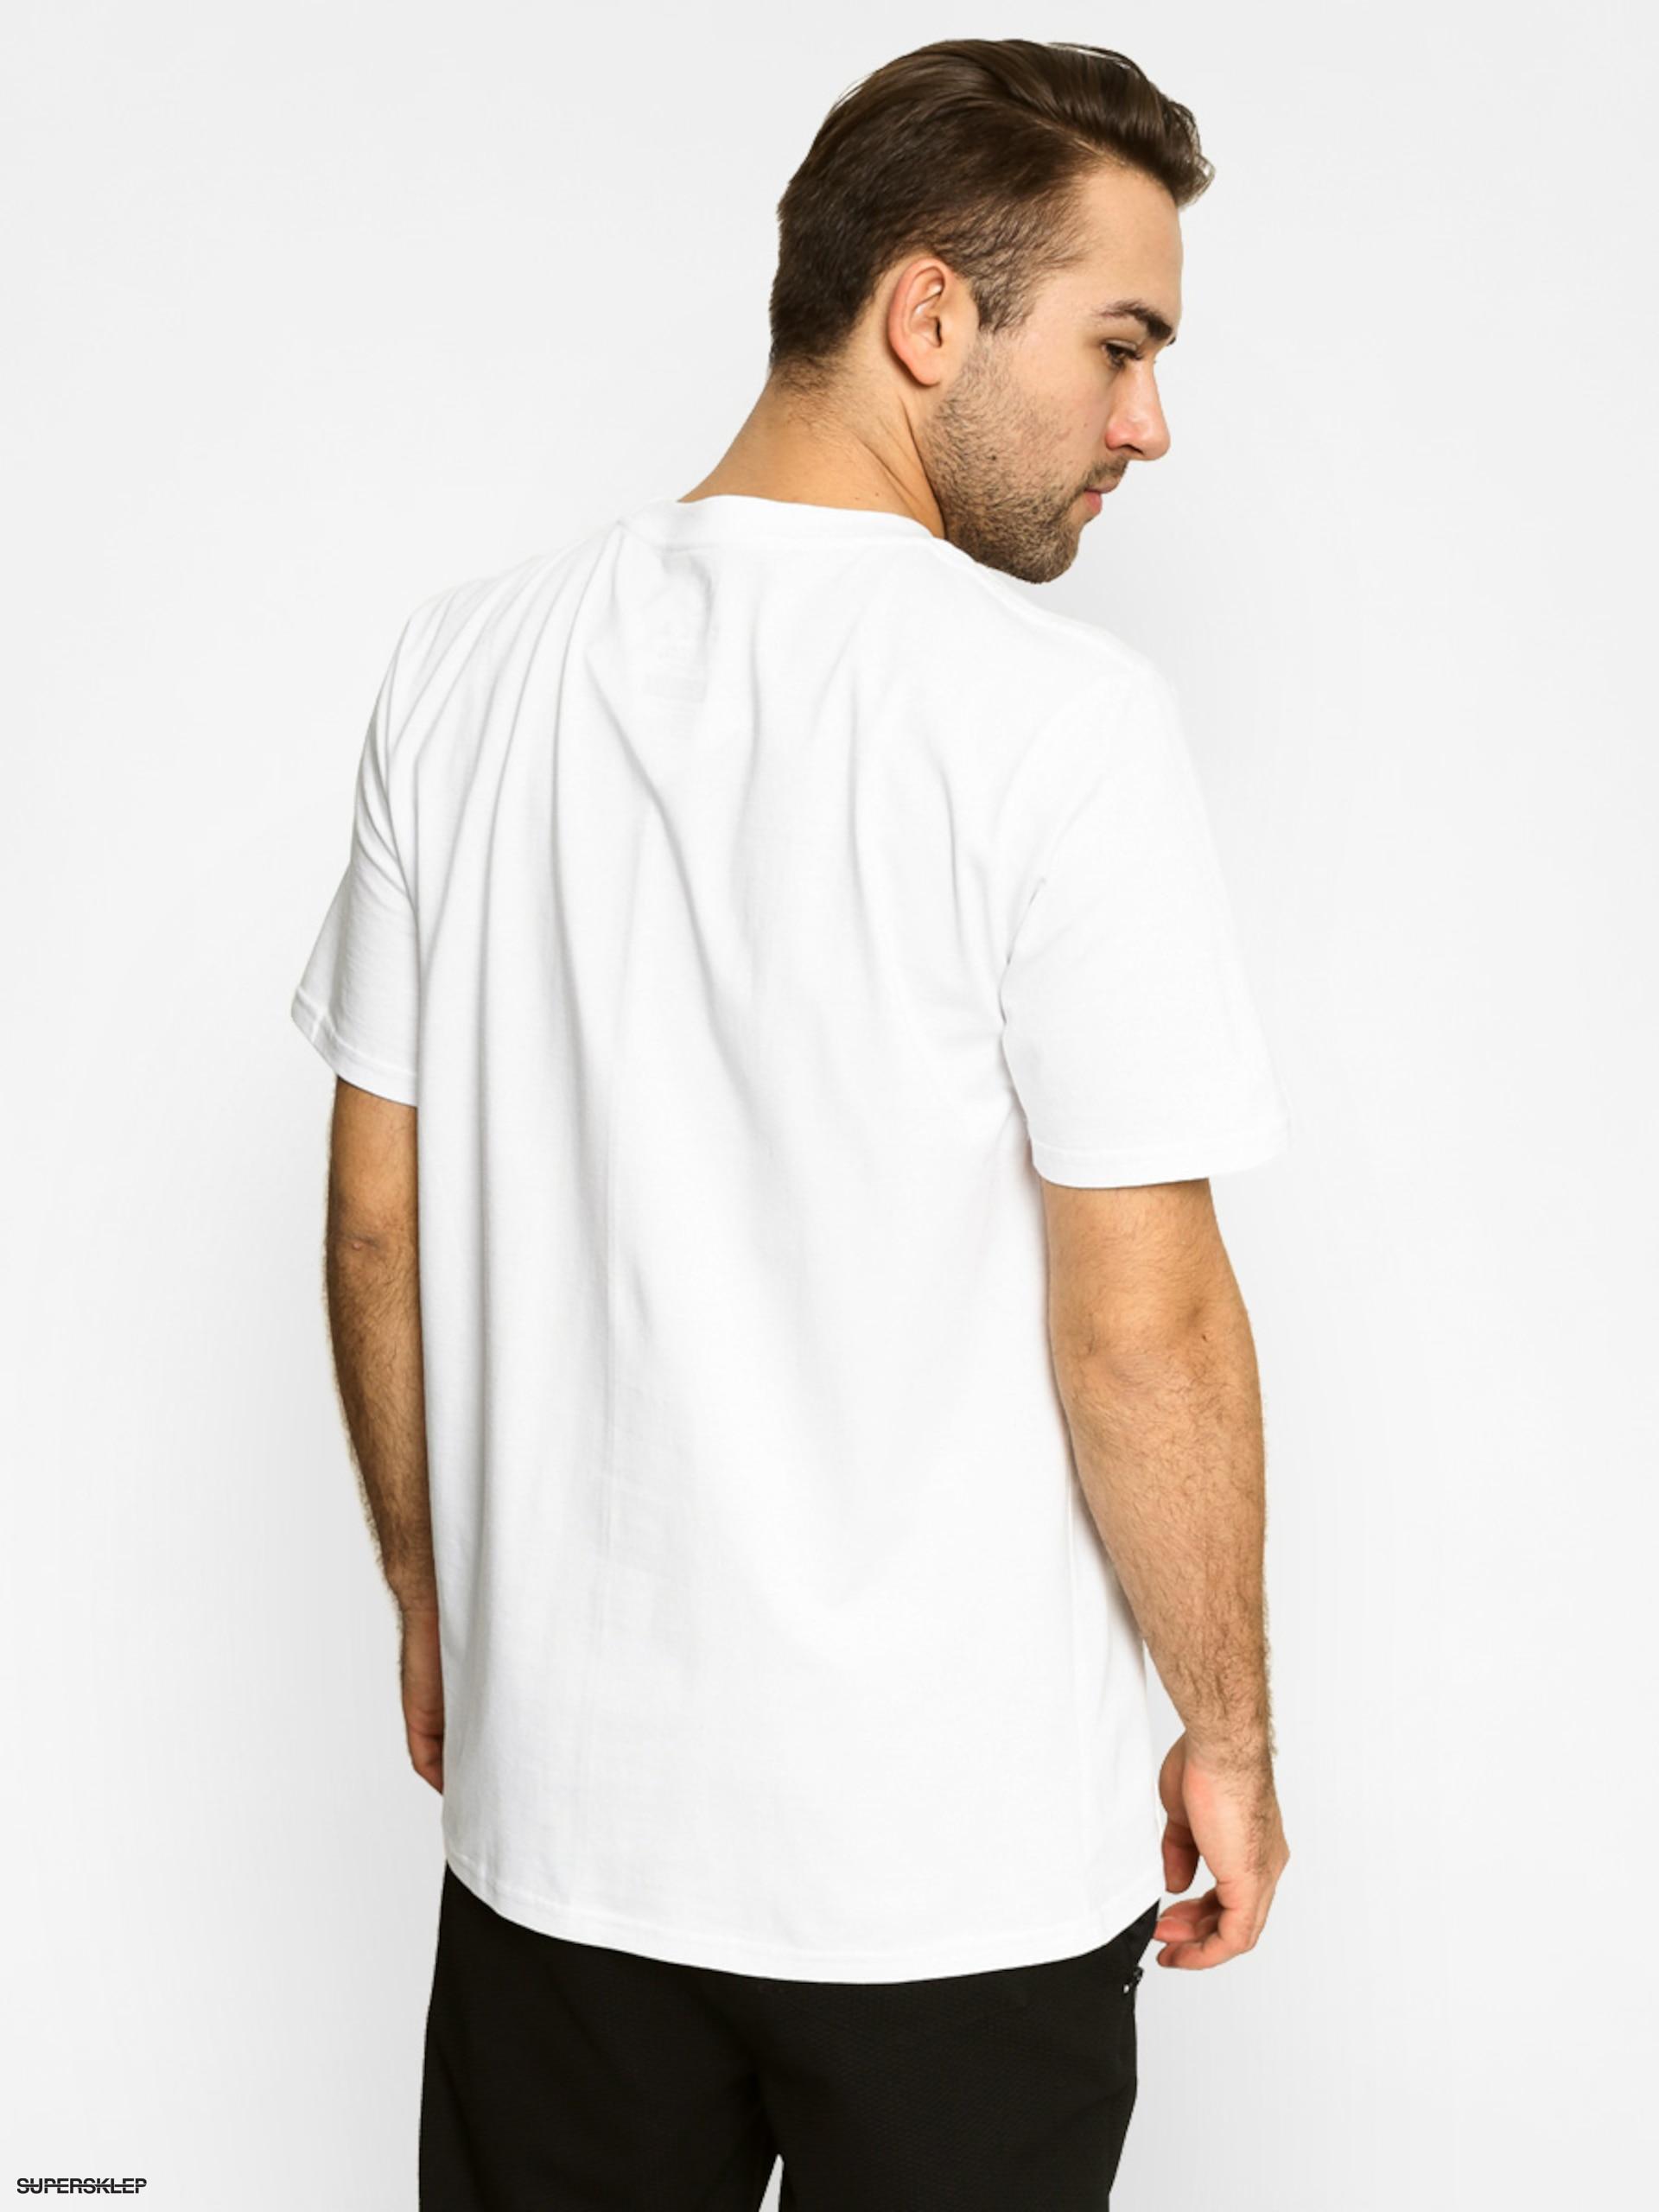 Boobs in white shirt pics